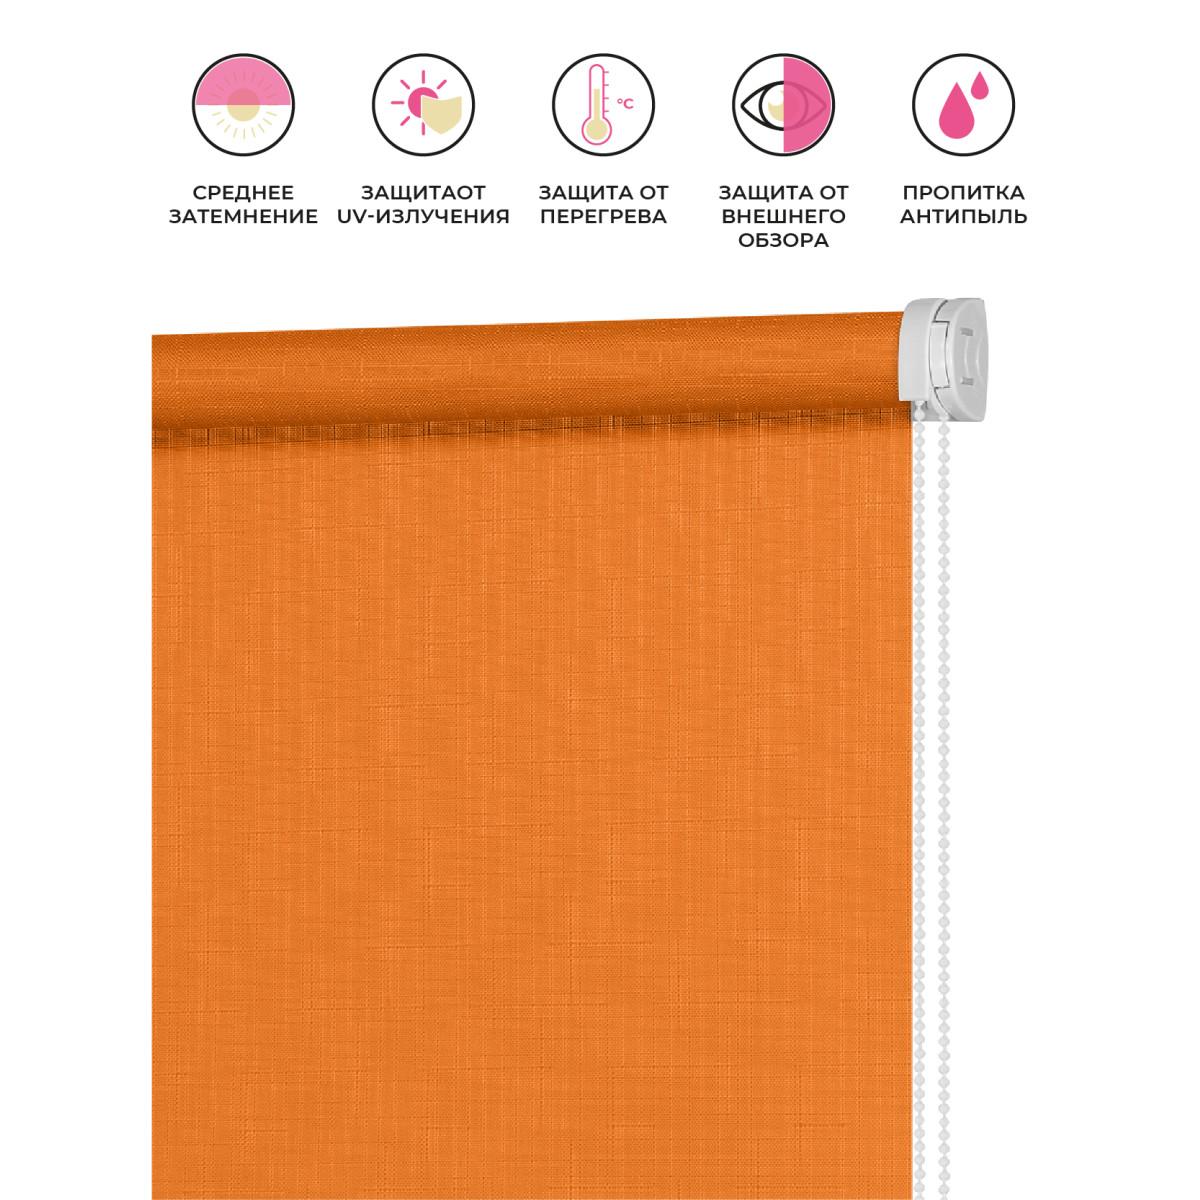 Рулонная Ора Decofest Апилера 70Х160 Цвет Оранжевый